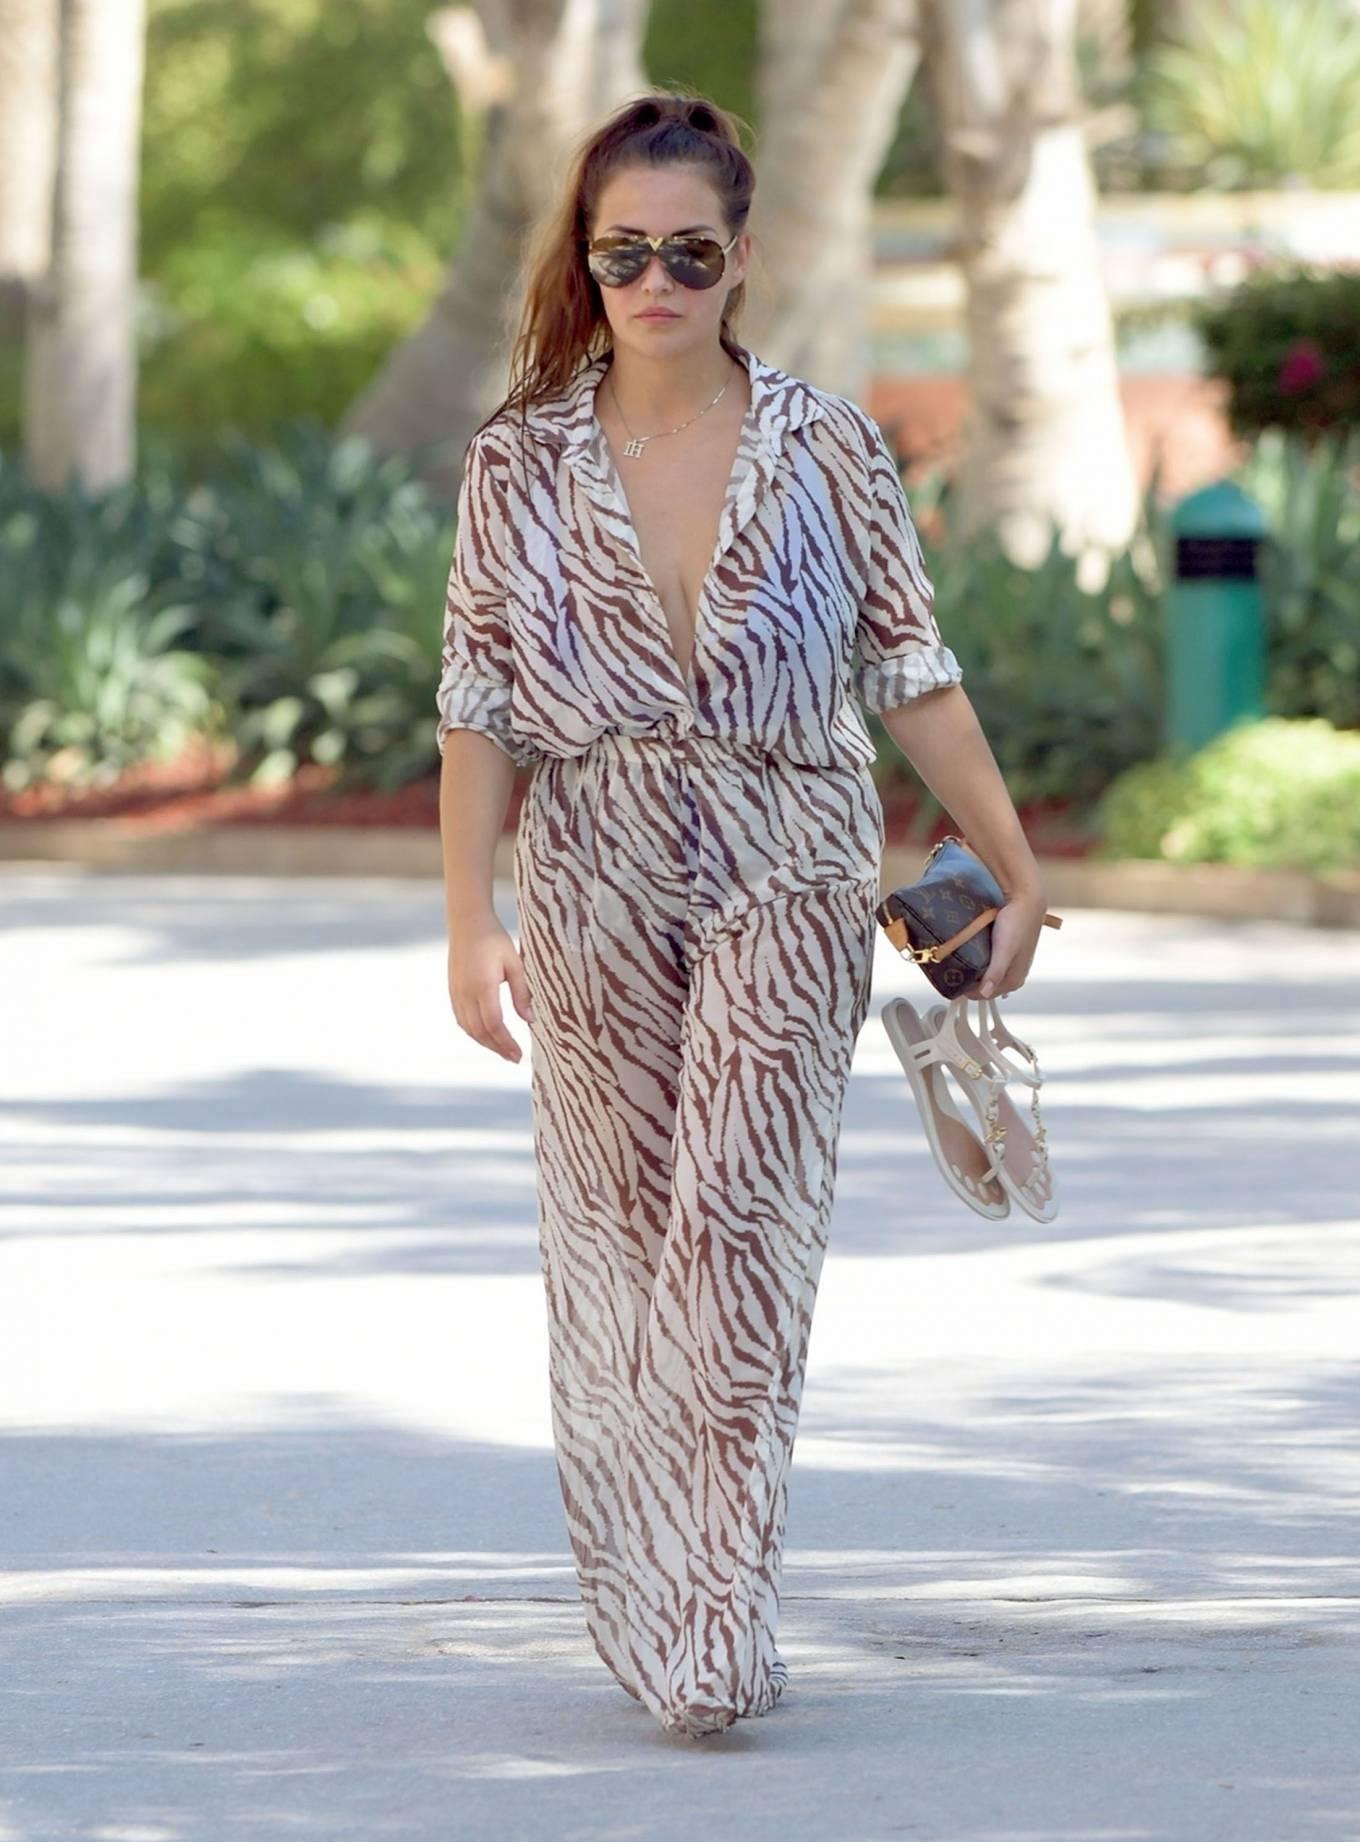 Chloe Goodman 2020 : Chloe Goodman – In a zebra print jumpsuit out on holiday in Dubai-07